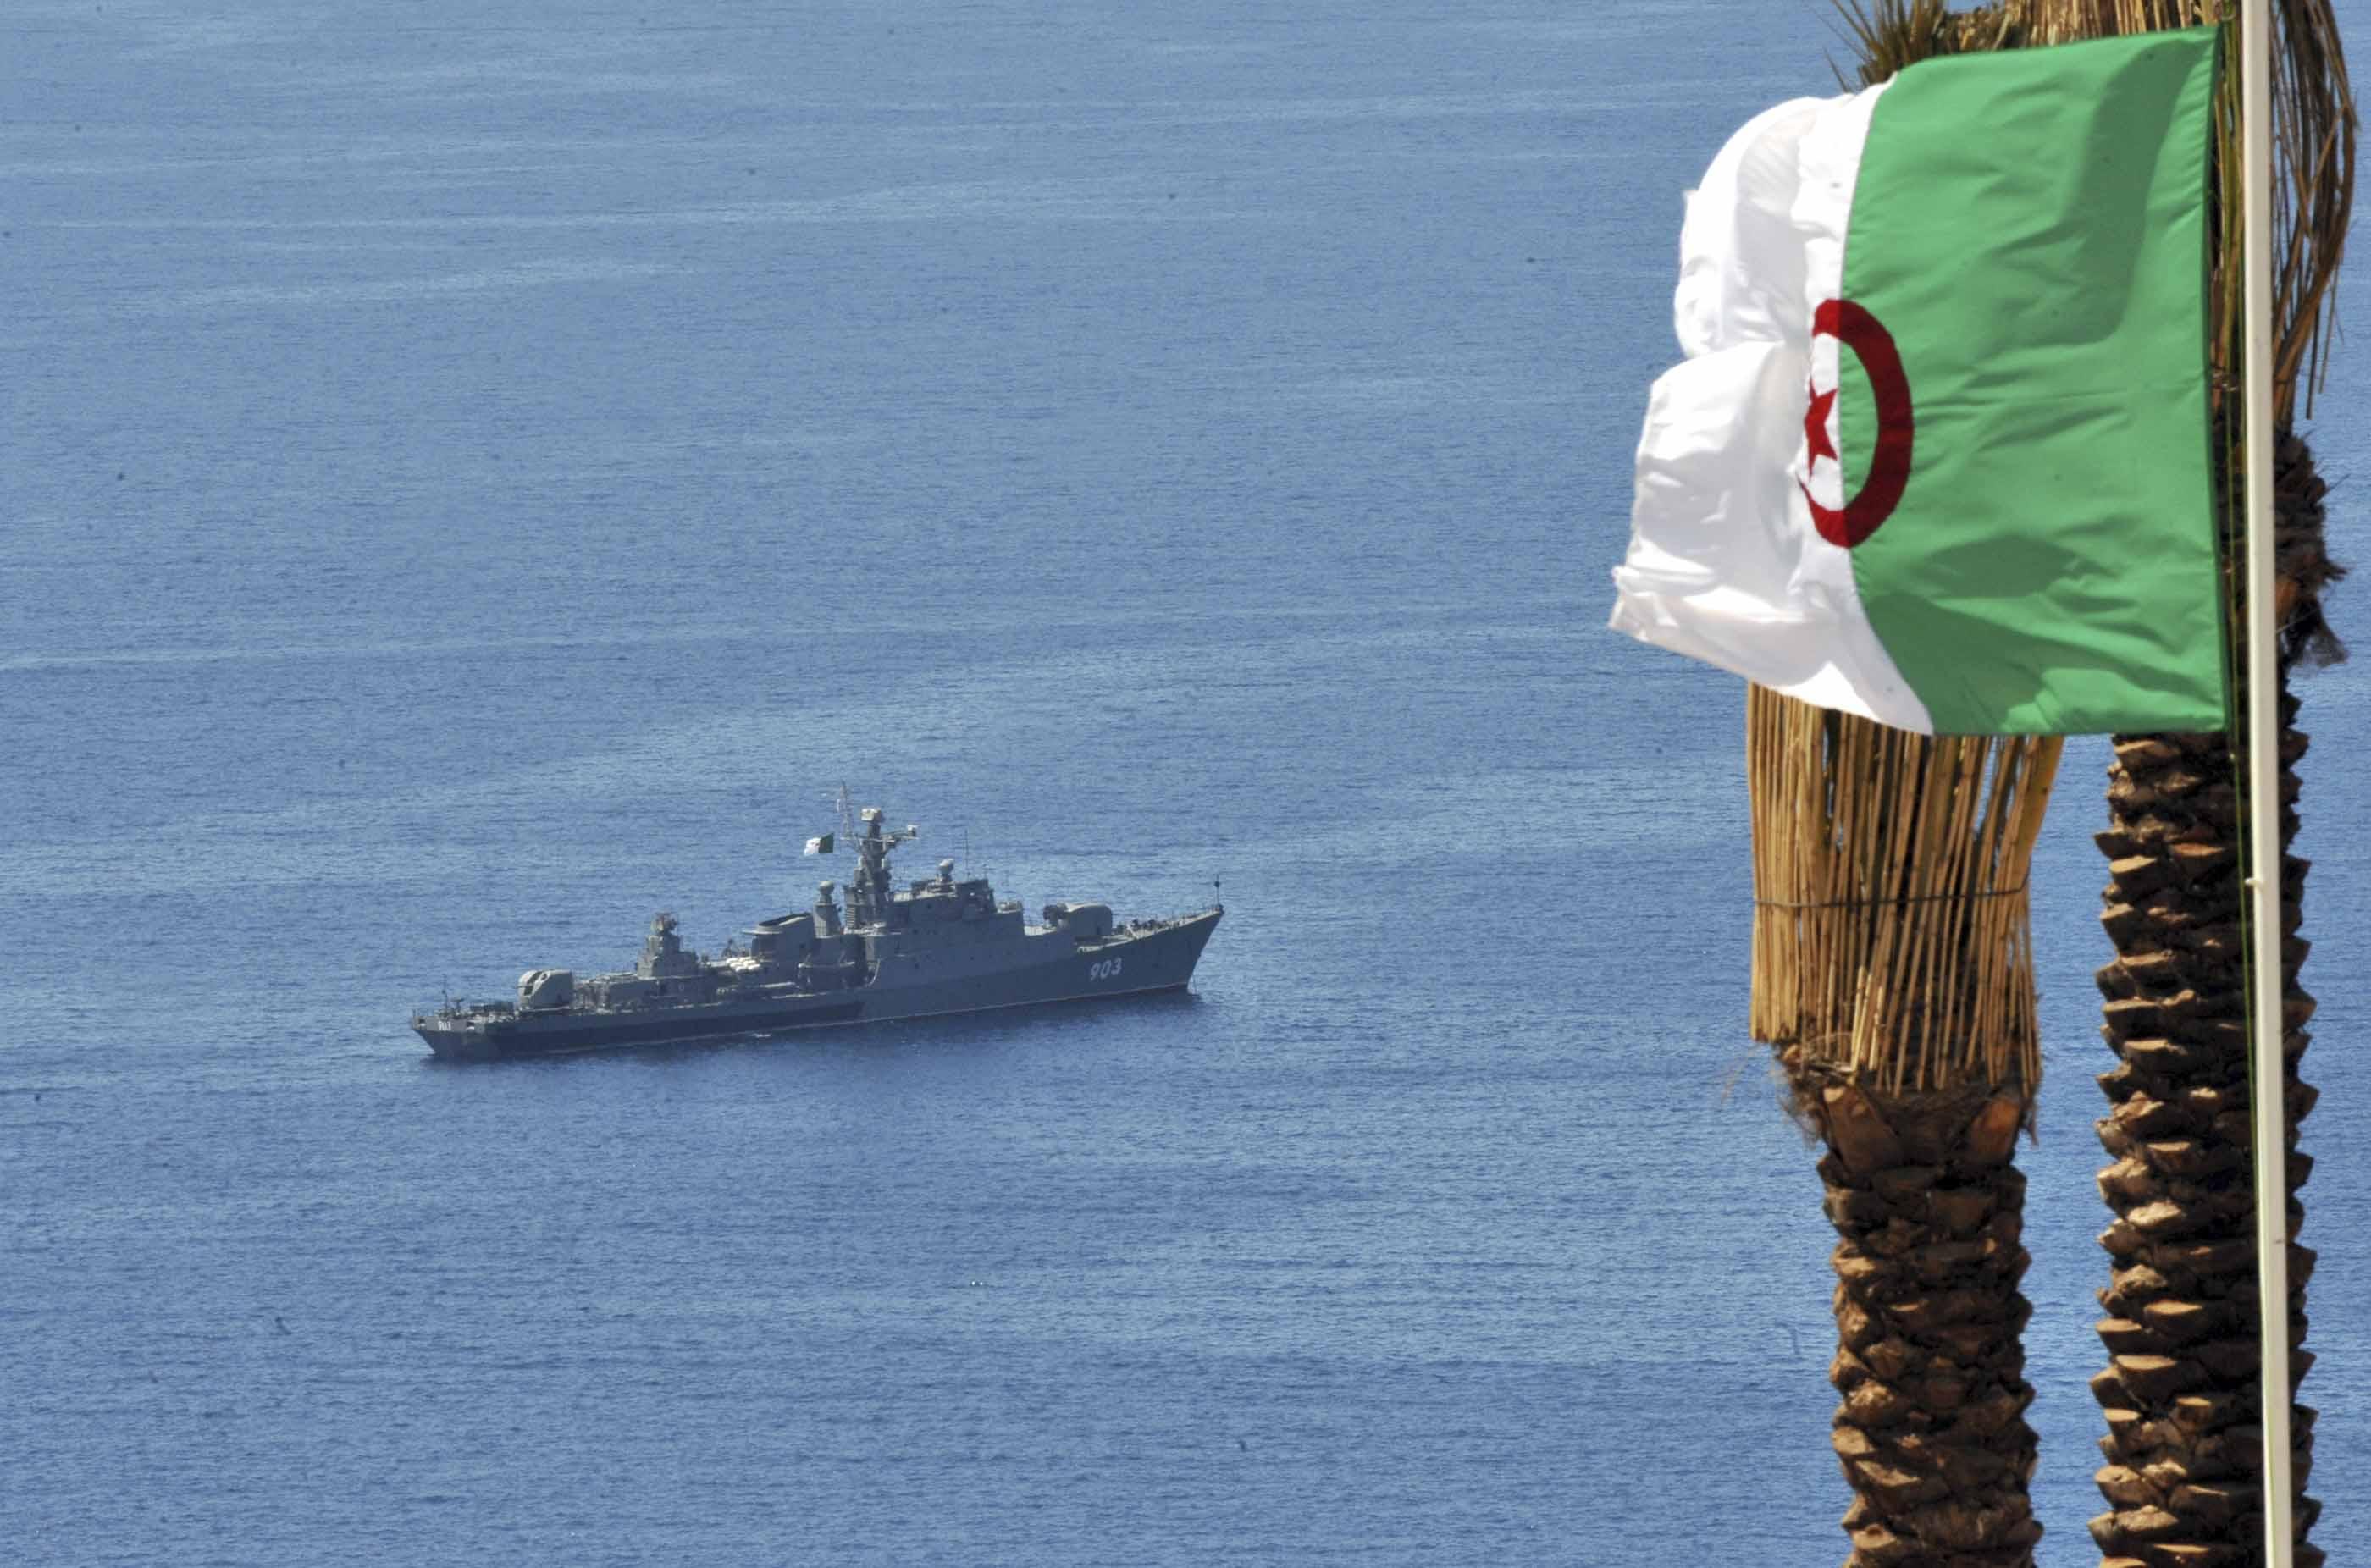 Fayez Nureldine / AFP